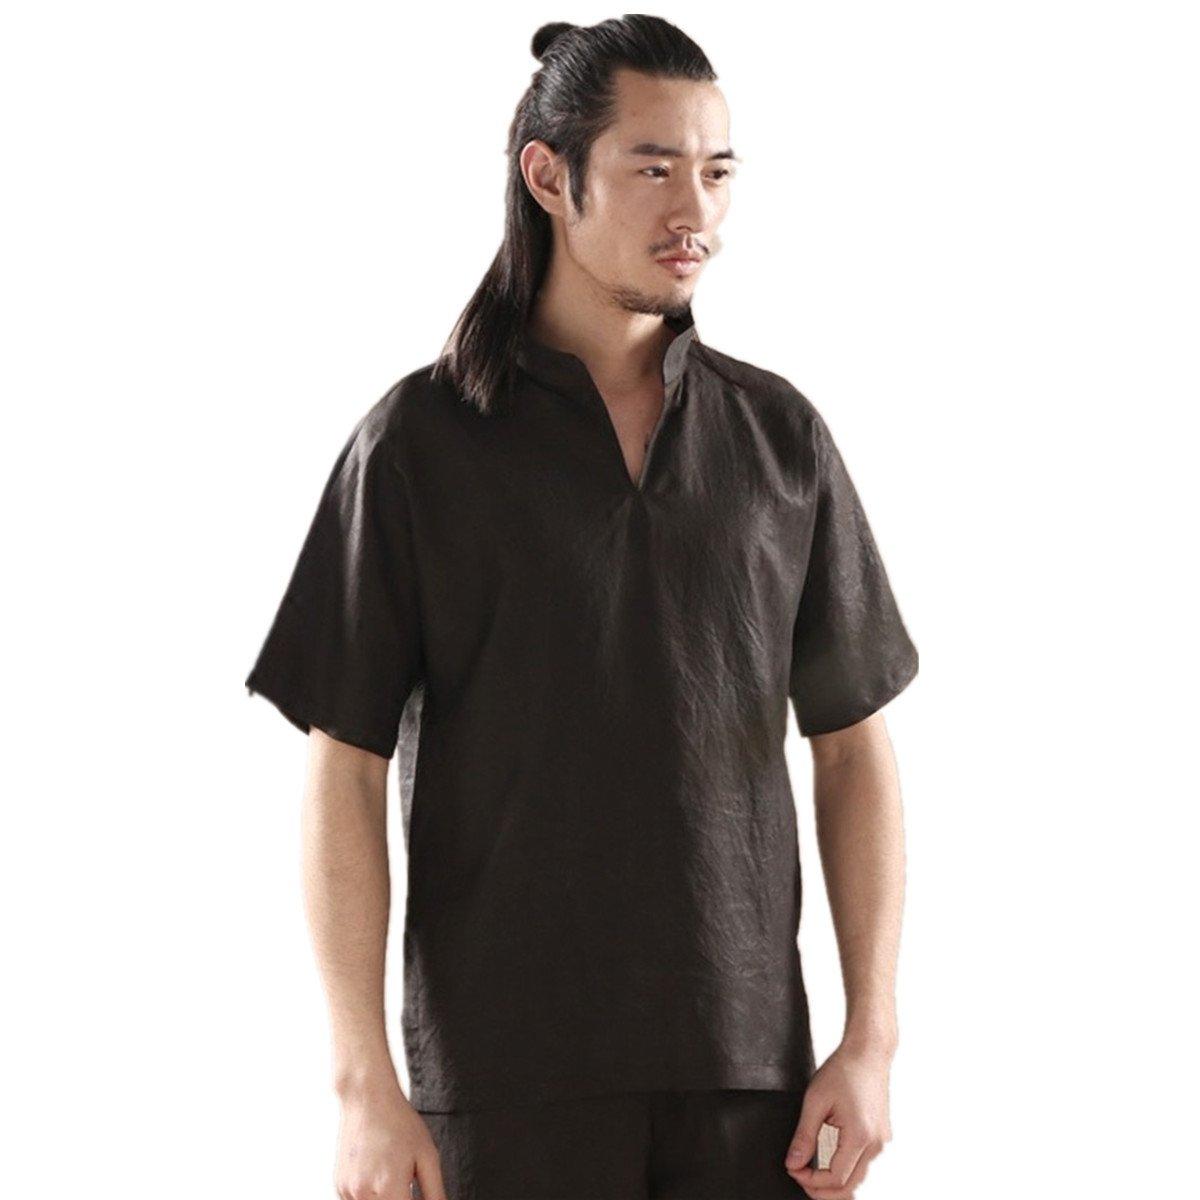 WEISAN Men Chinese Traditional Mulberry Silk Shirt Stand Collar Short Sleeve Costume